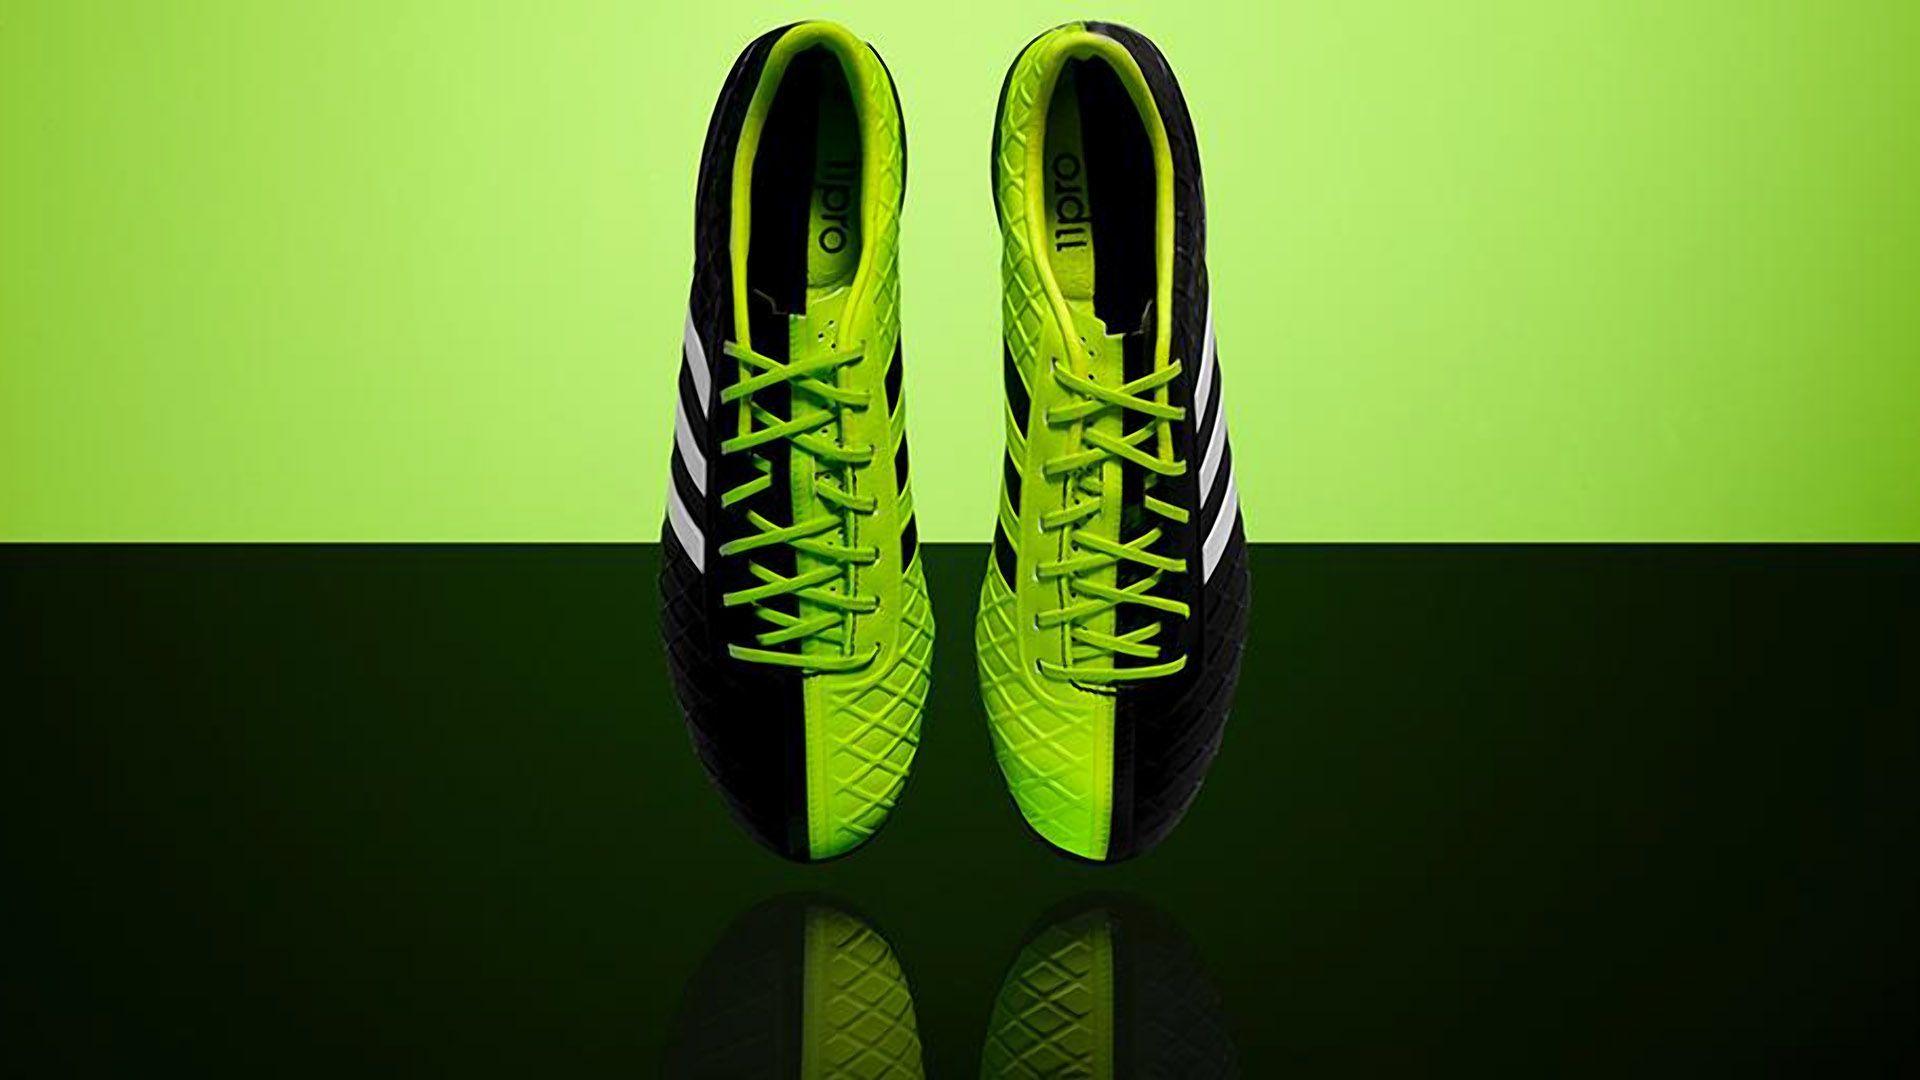 Adidas Adipure 11pro Super Light Football Boots Wallpaper Free Football Boots Adipure 2015 Boots